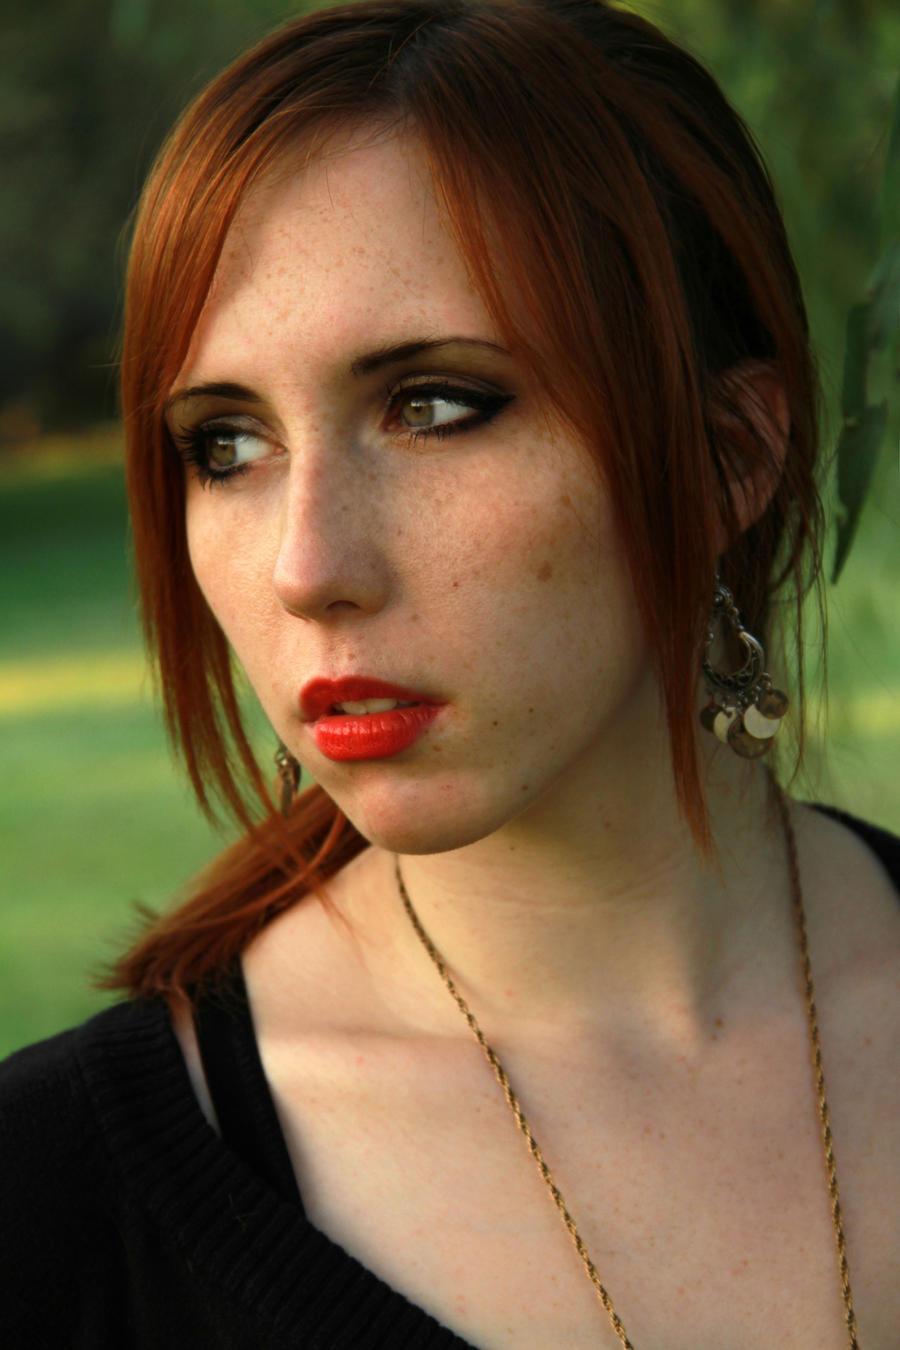 Redhead in the prairie by Stephanie-van-Rijn